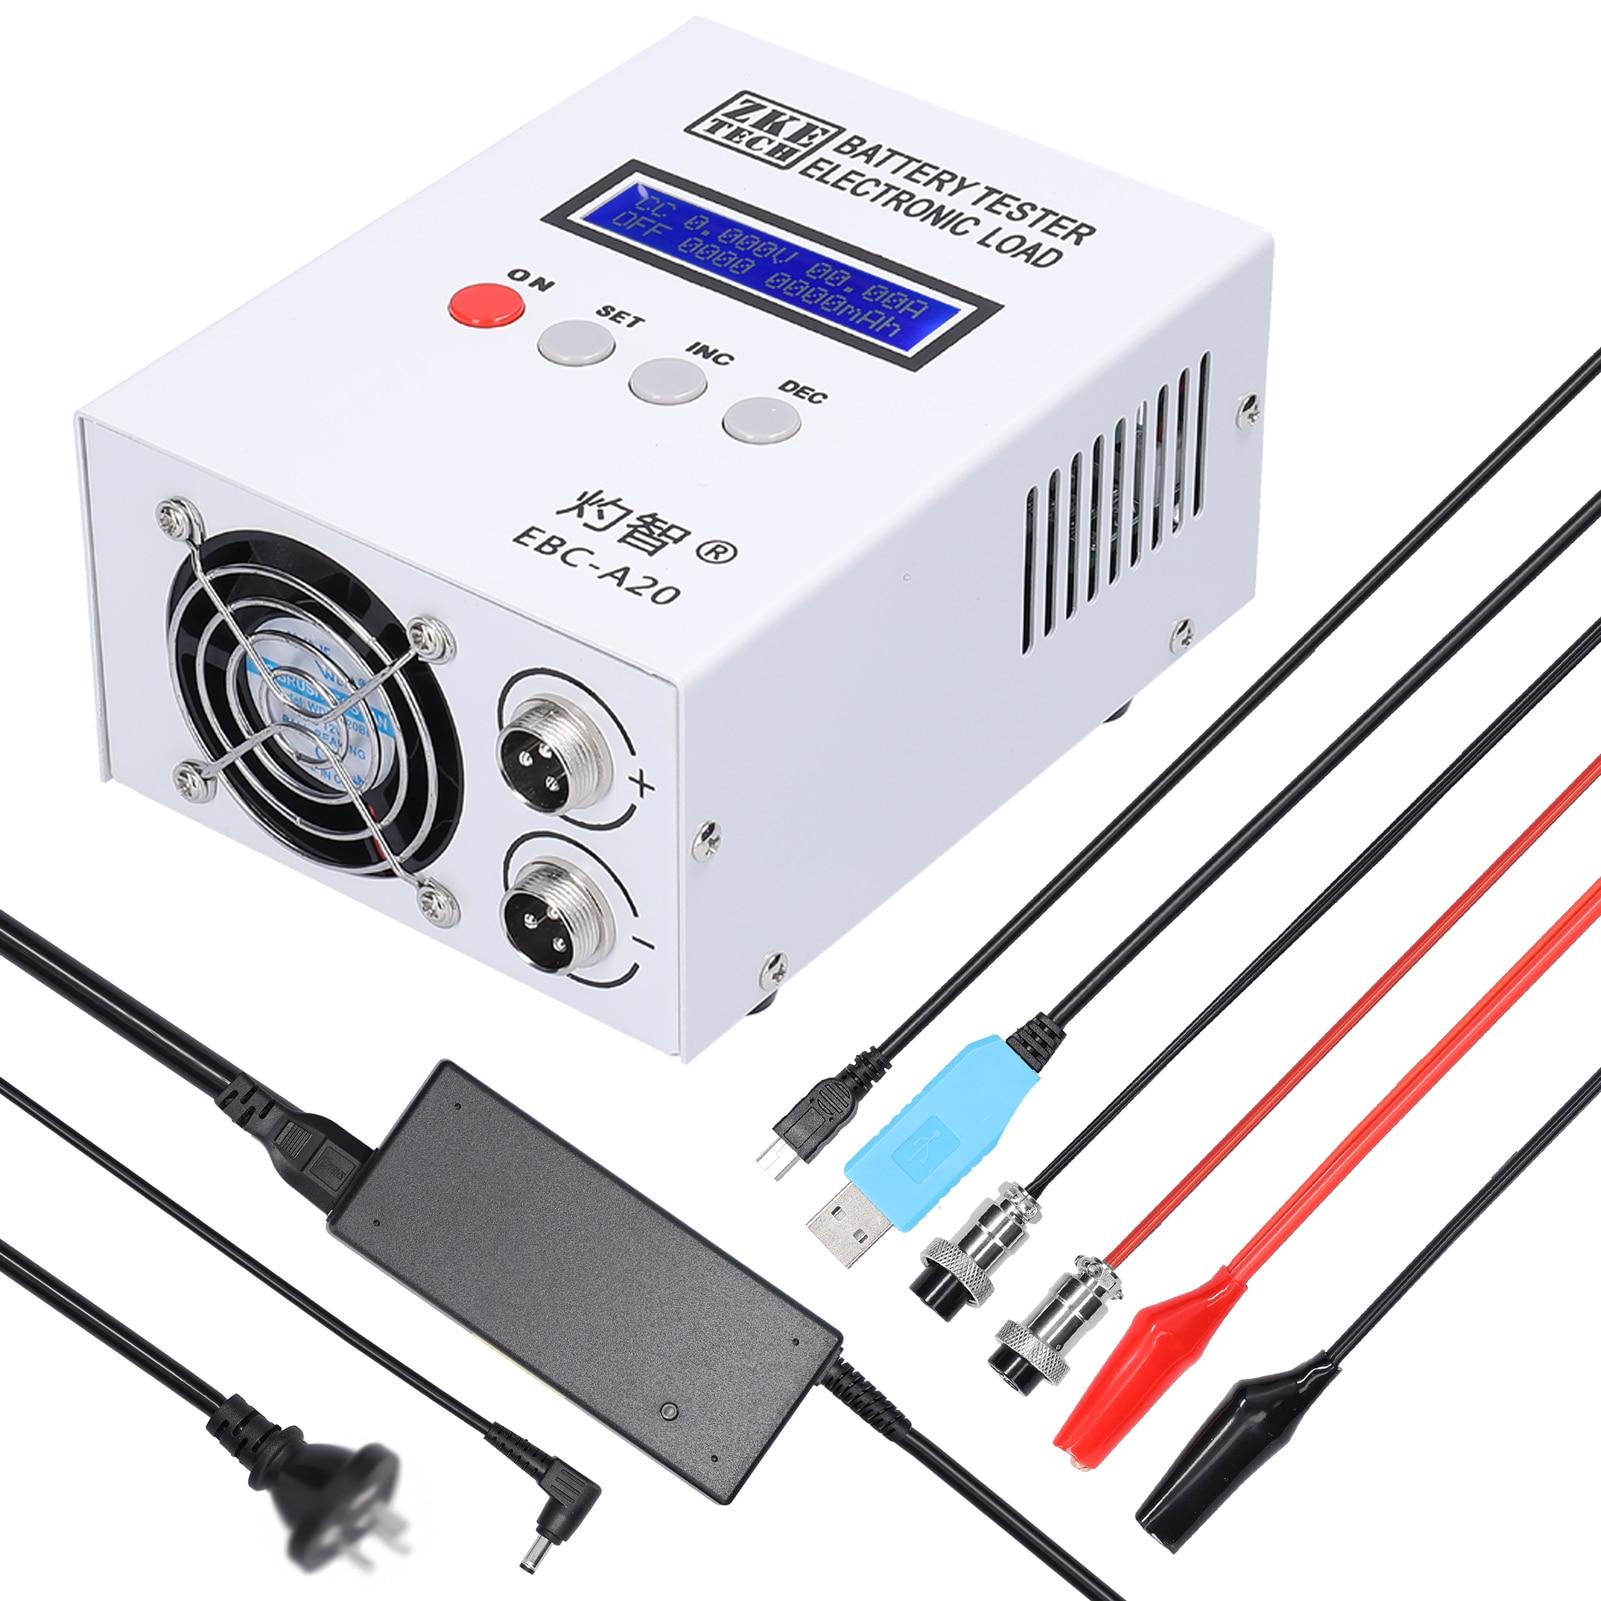 EBC-A20 جهاز اختبار بطارية 30 فولت 20A 85 واط بطارية ليثيوم الرصاص الحمضية اختبار قدرة 5A شحن 20A التفريغ دعم البرمجيات التحكم